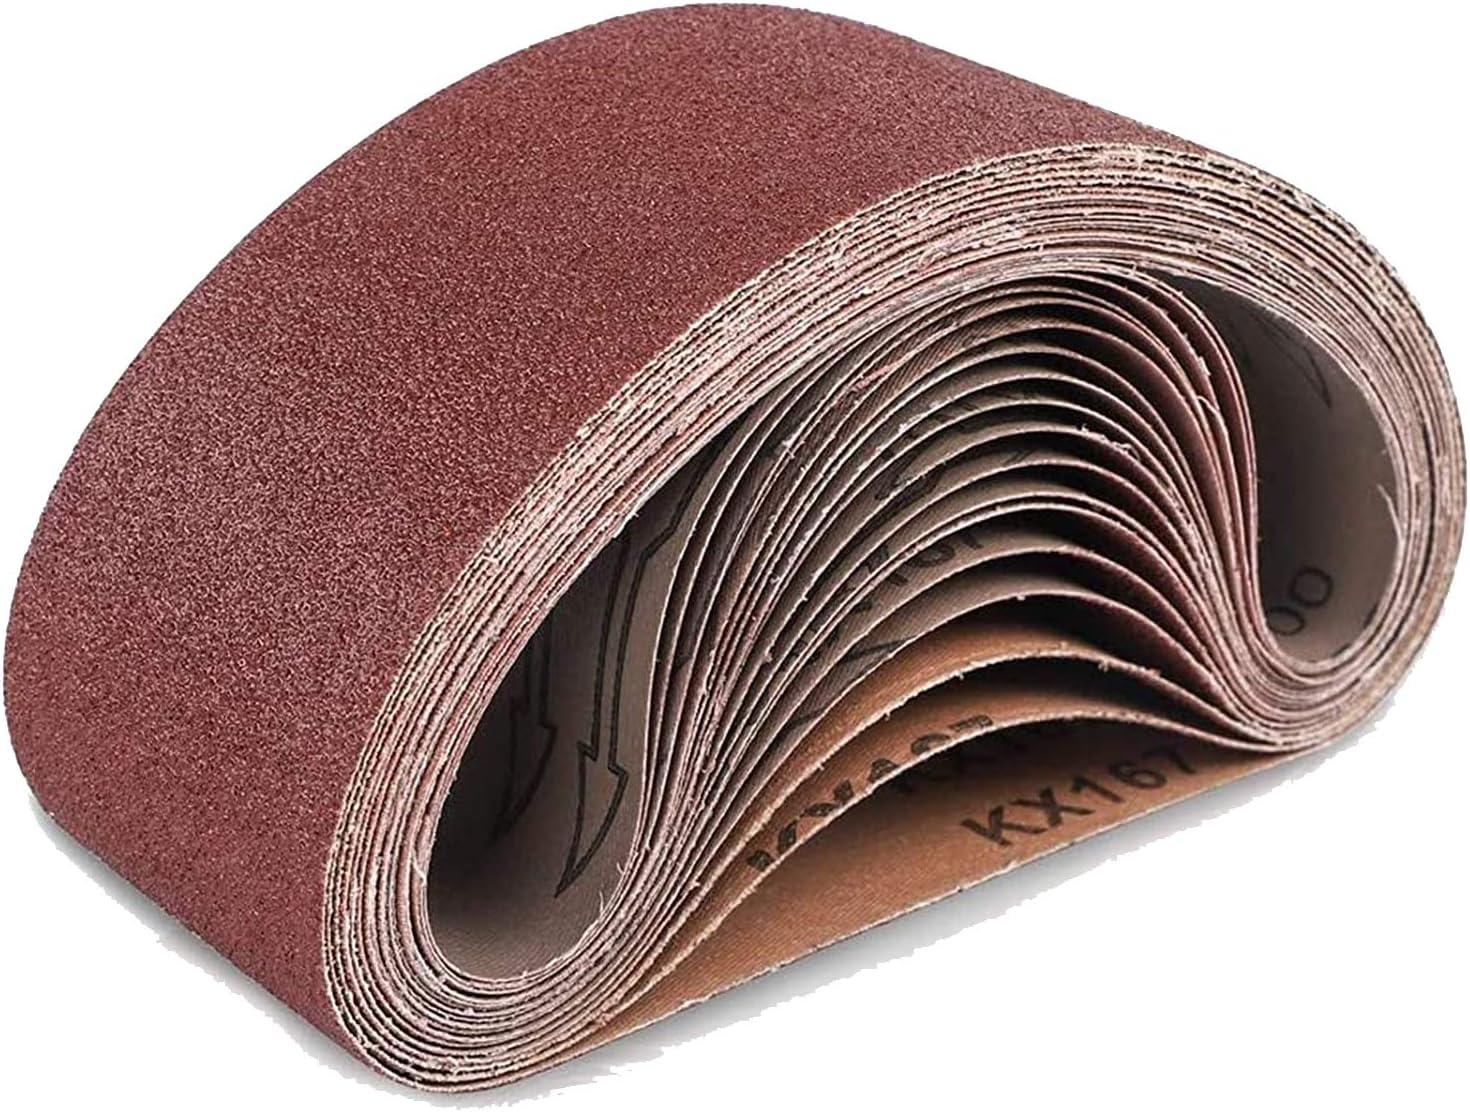 Remebe Lijadora de banda 75 x 533 mm Bandas de lijado Papel de lijadora de banda 40,60,80,120,180 Granos Banda de lijado de tela//tela Granos surtidos 10PCS